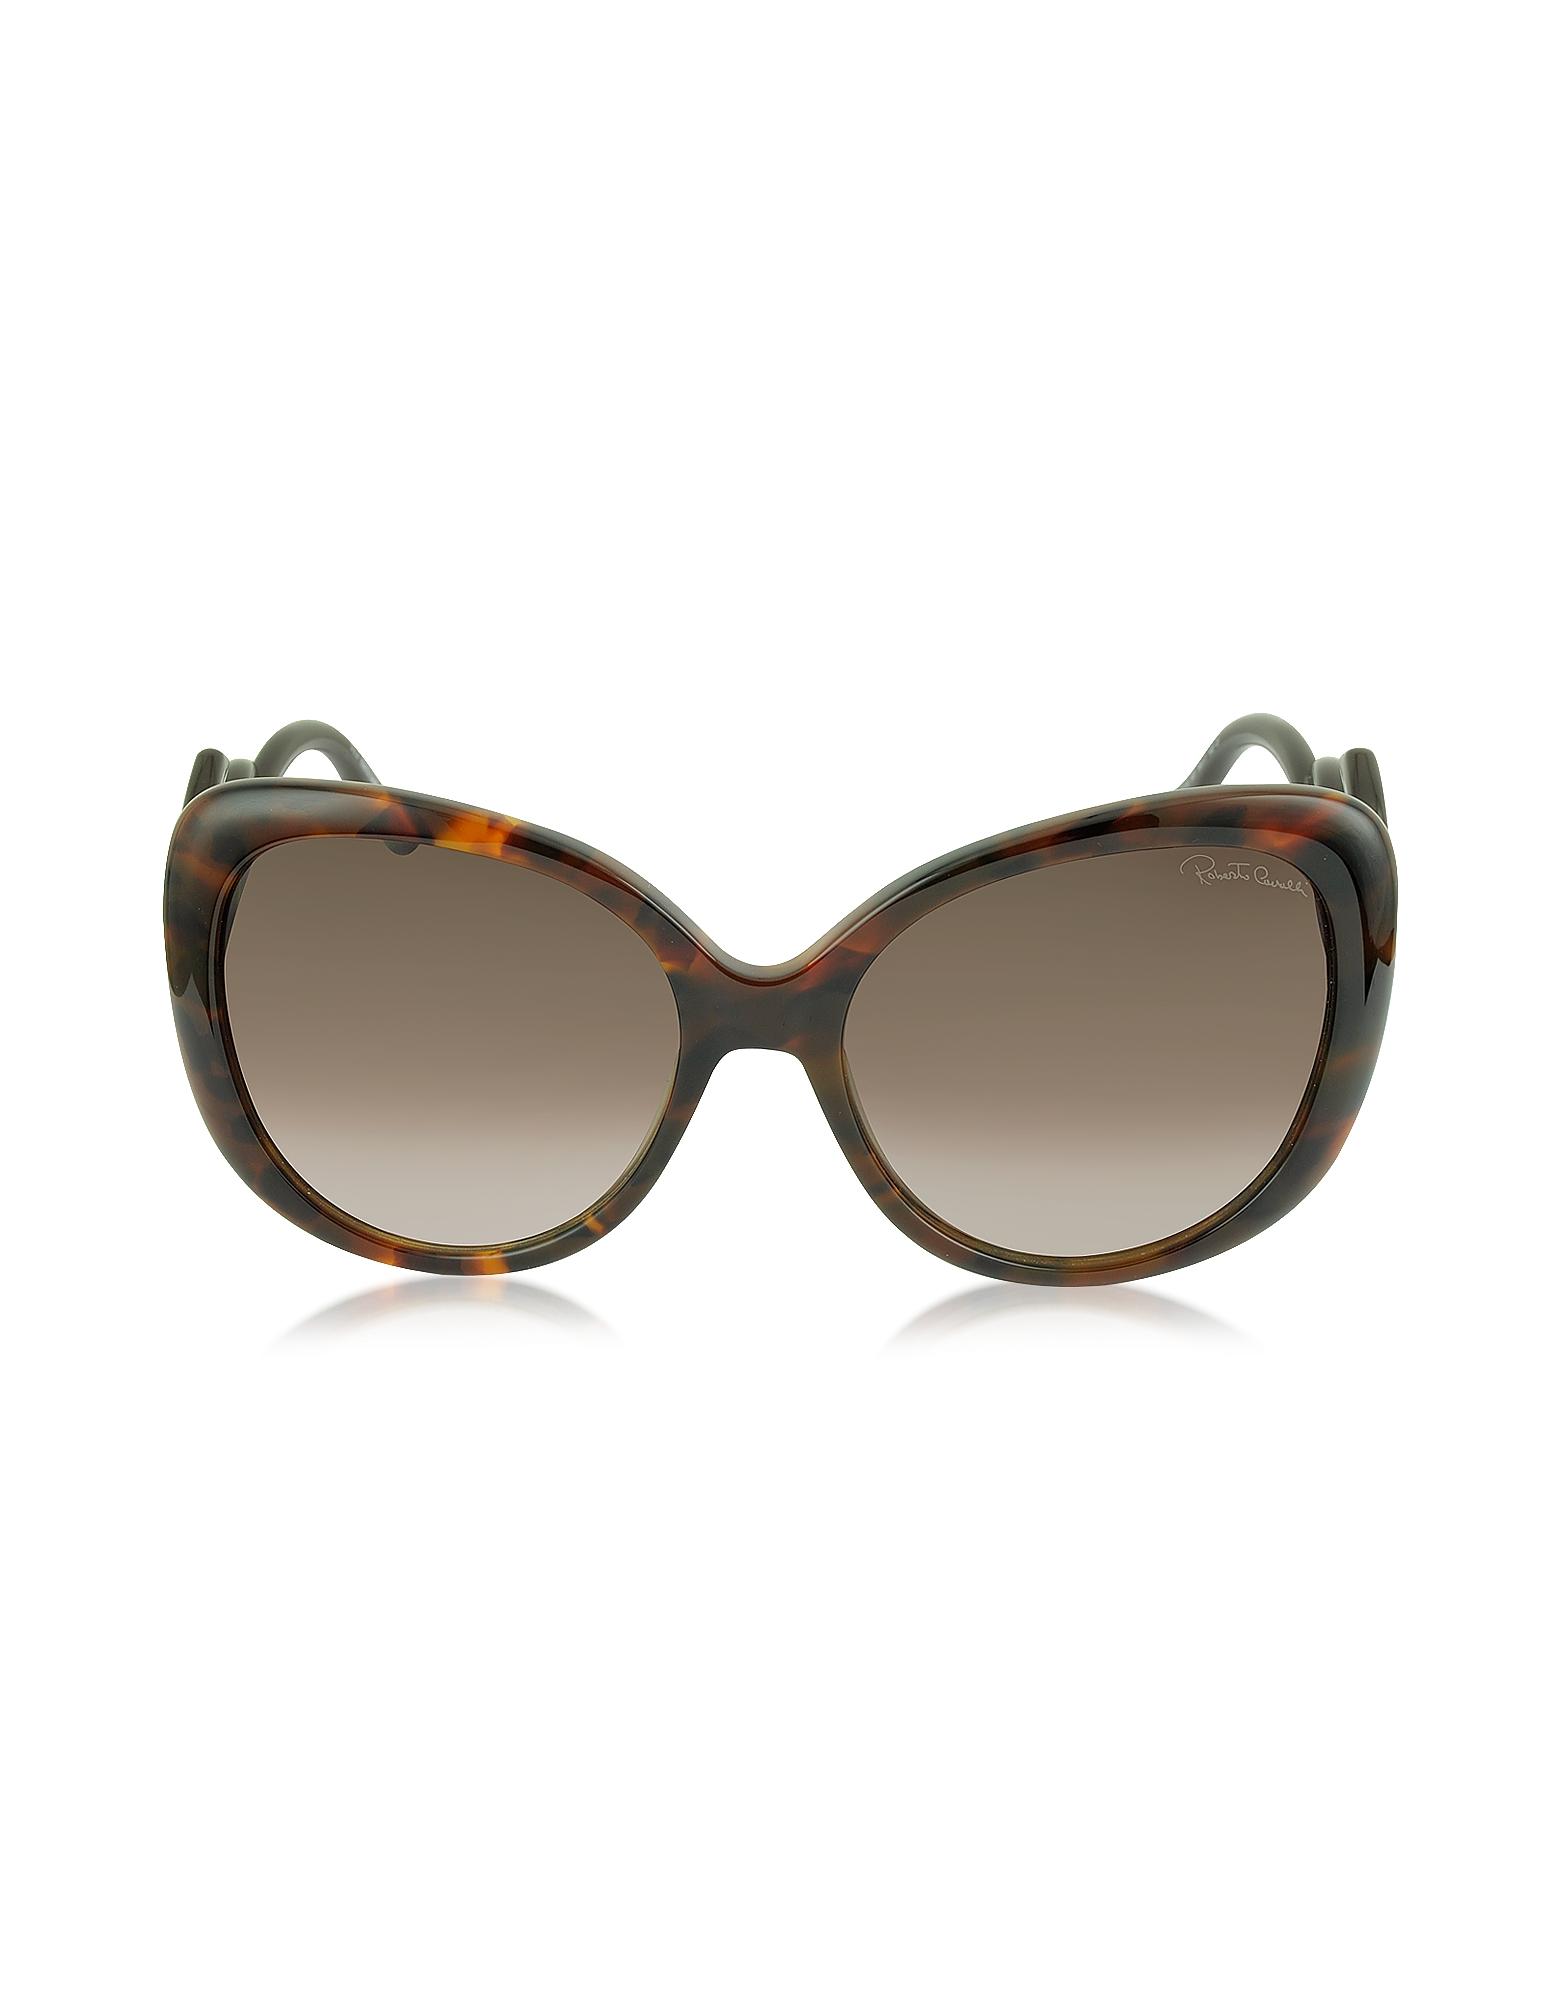 Roberto Cavalli Designer Sunglasses, Mintaka 911S 52F Havana Acetate Women's Sunglasses